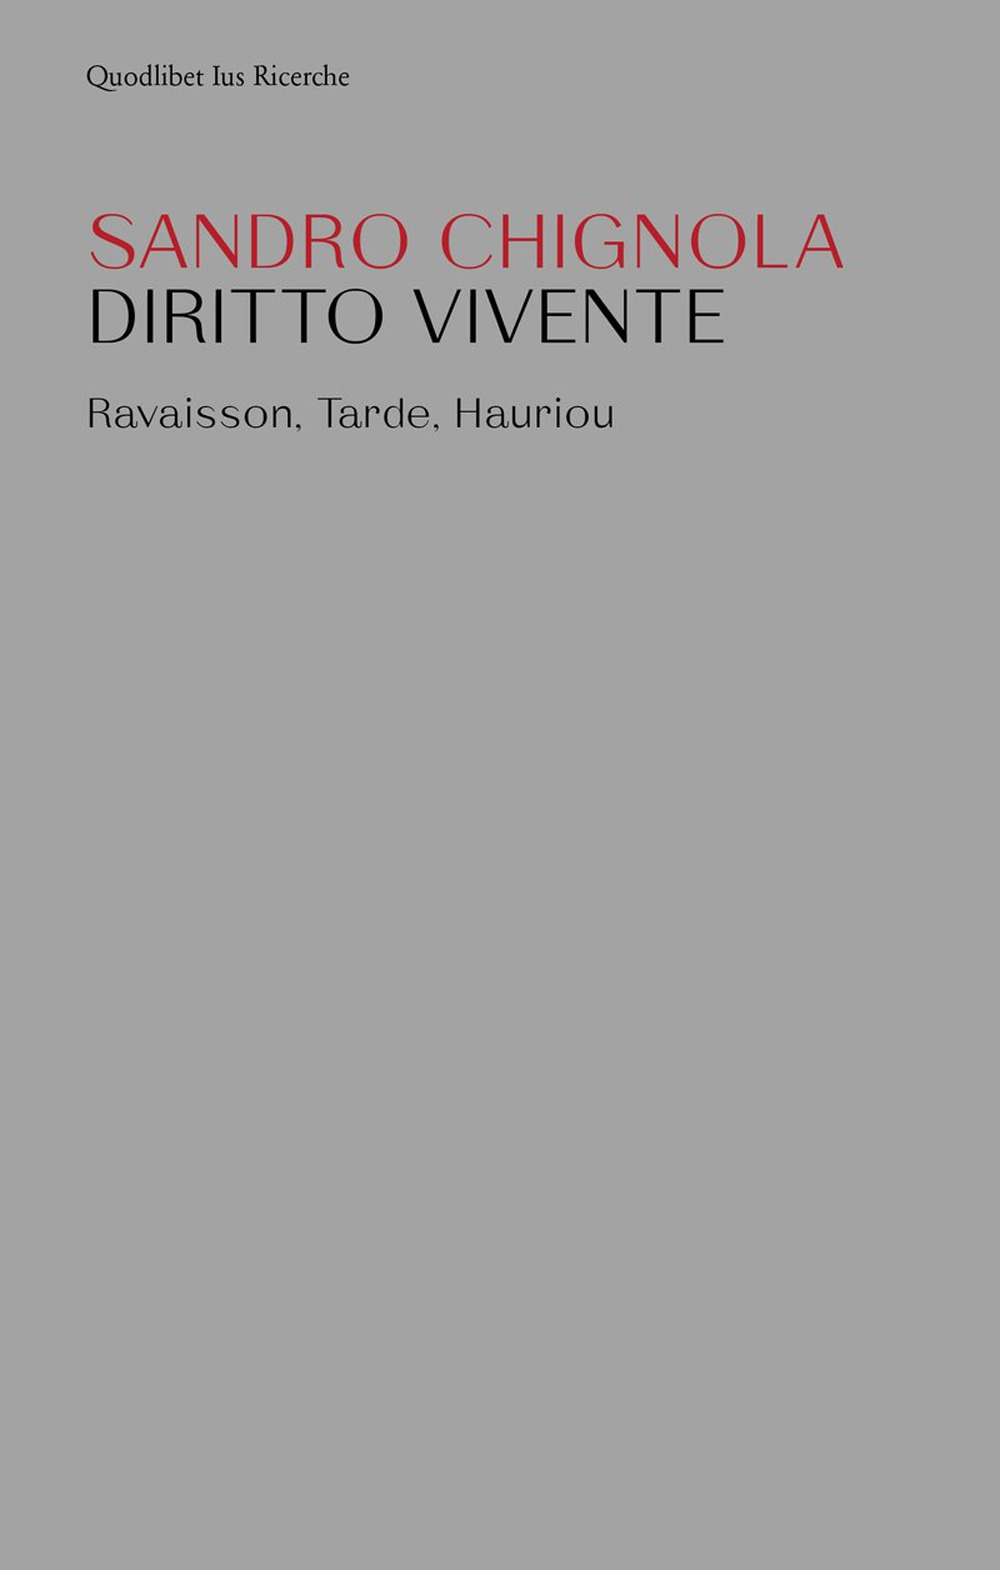 DIRITTO VIVENTE. RAVAISON, TARDE, HAURIOU - Chignola Sandro - 9788822905017